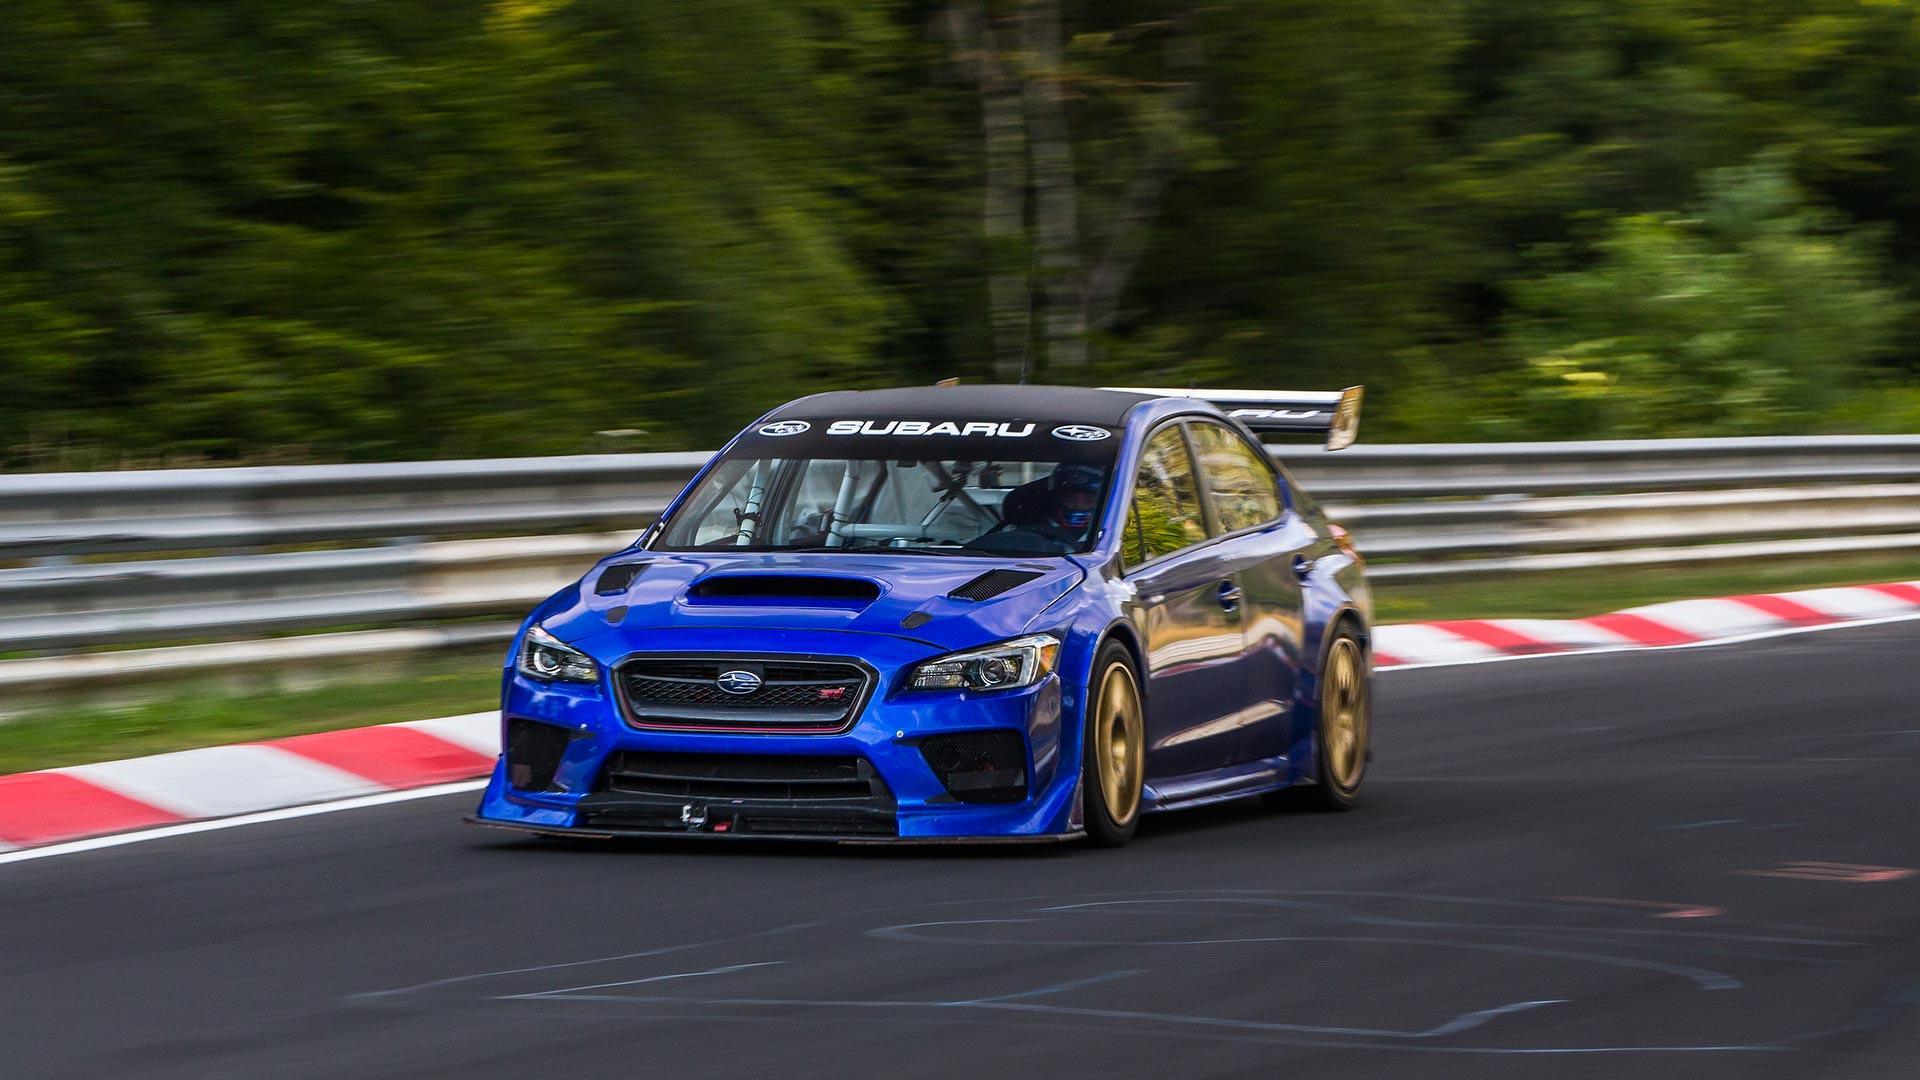 Watch The Subaru STI NBR Special Set Sedan Lap Record At The